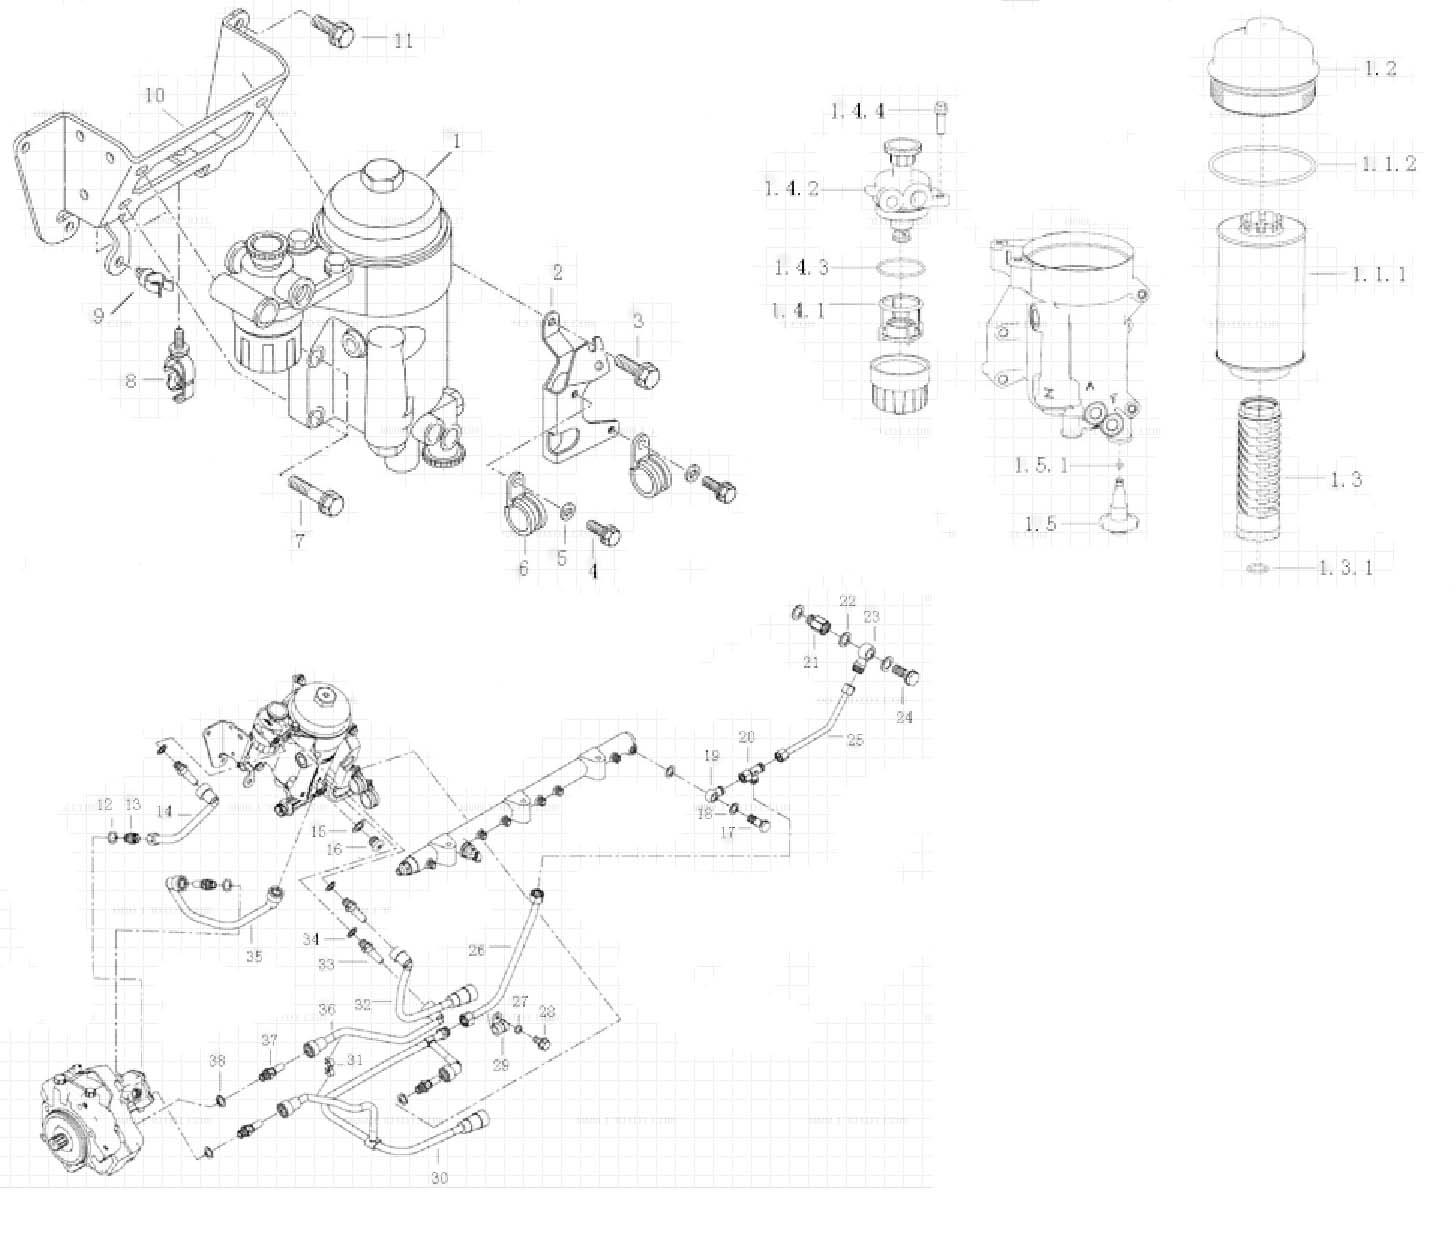 Fuel Filter Mc11 Engine Parts Catalogs